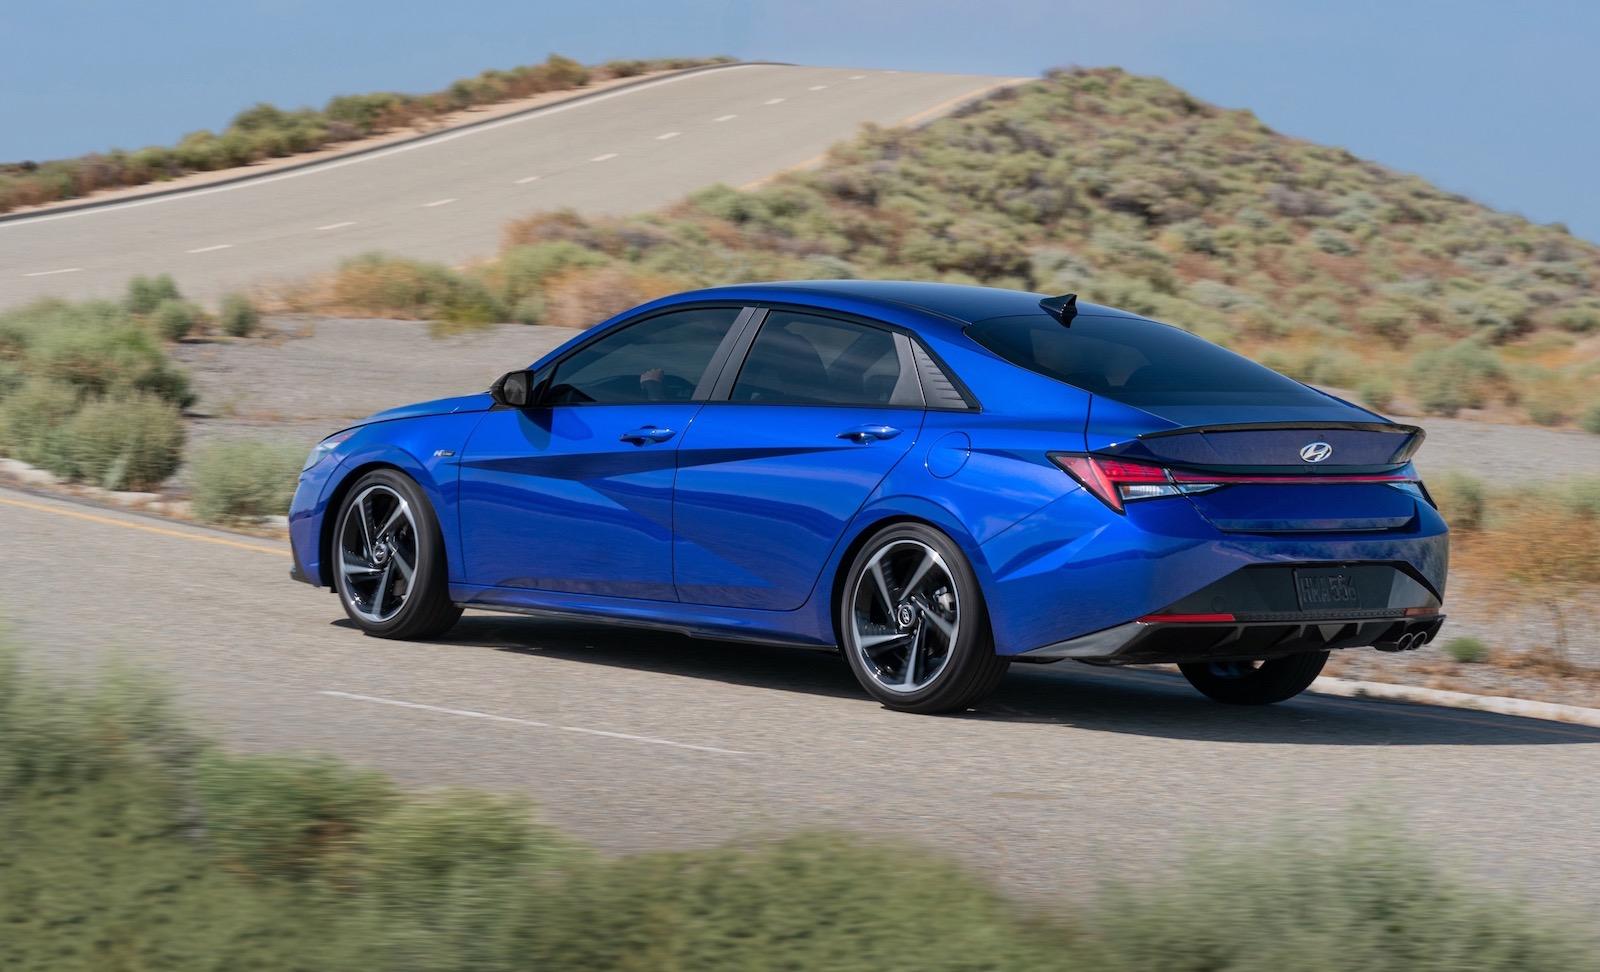 2021 hyundai i30 sedan n line debuts, on sale in australia